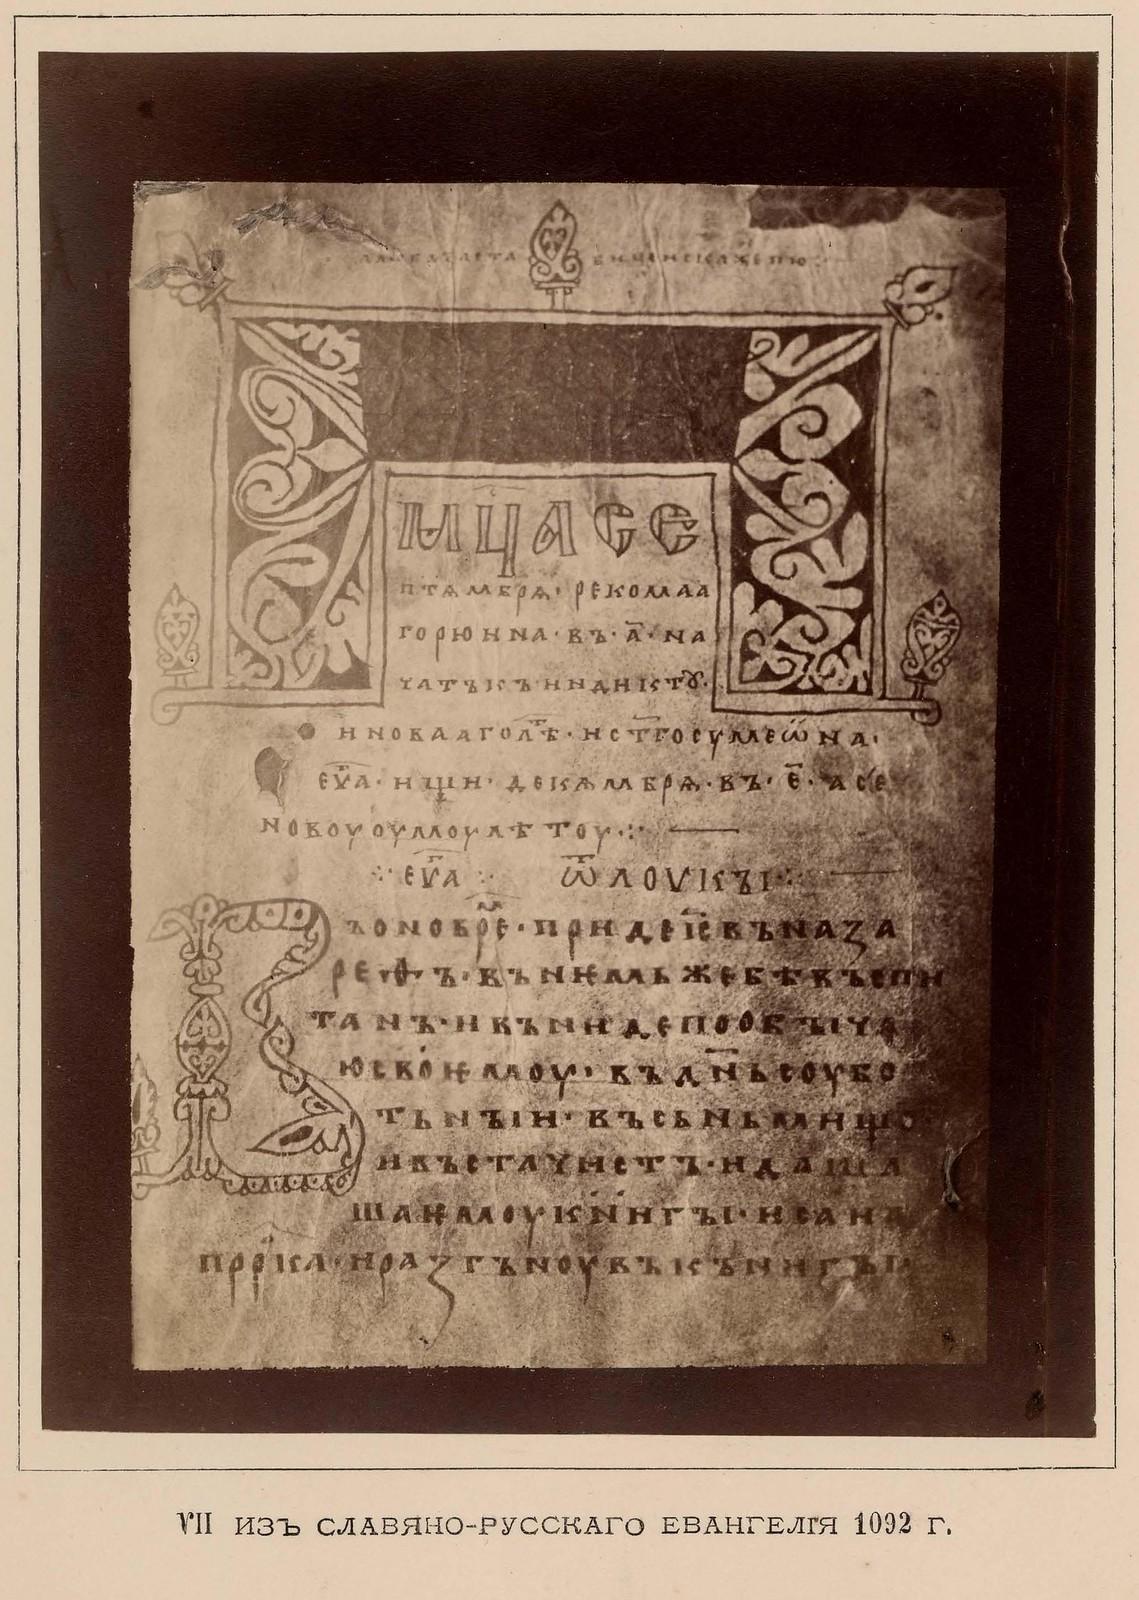 19. VIII. Из Славяно-русского Евангелия 1164 г.